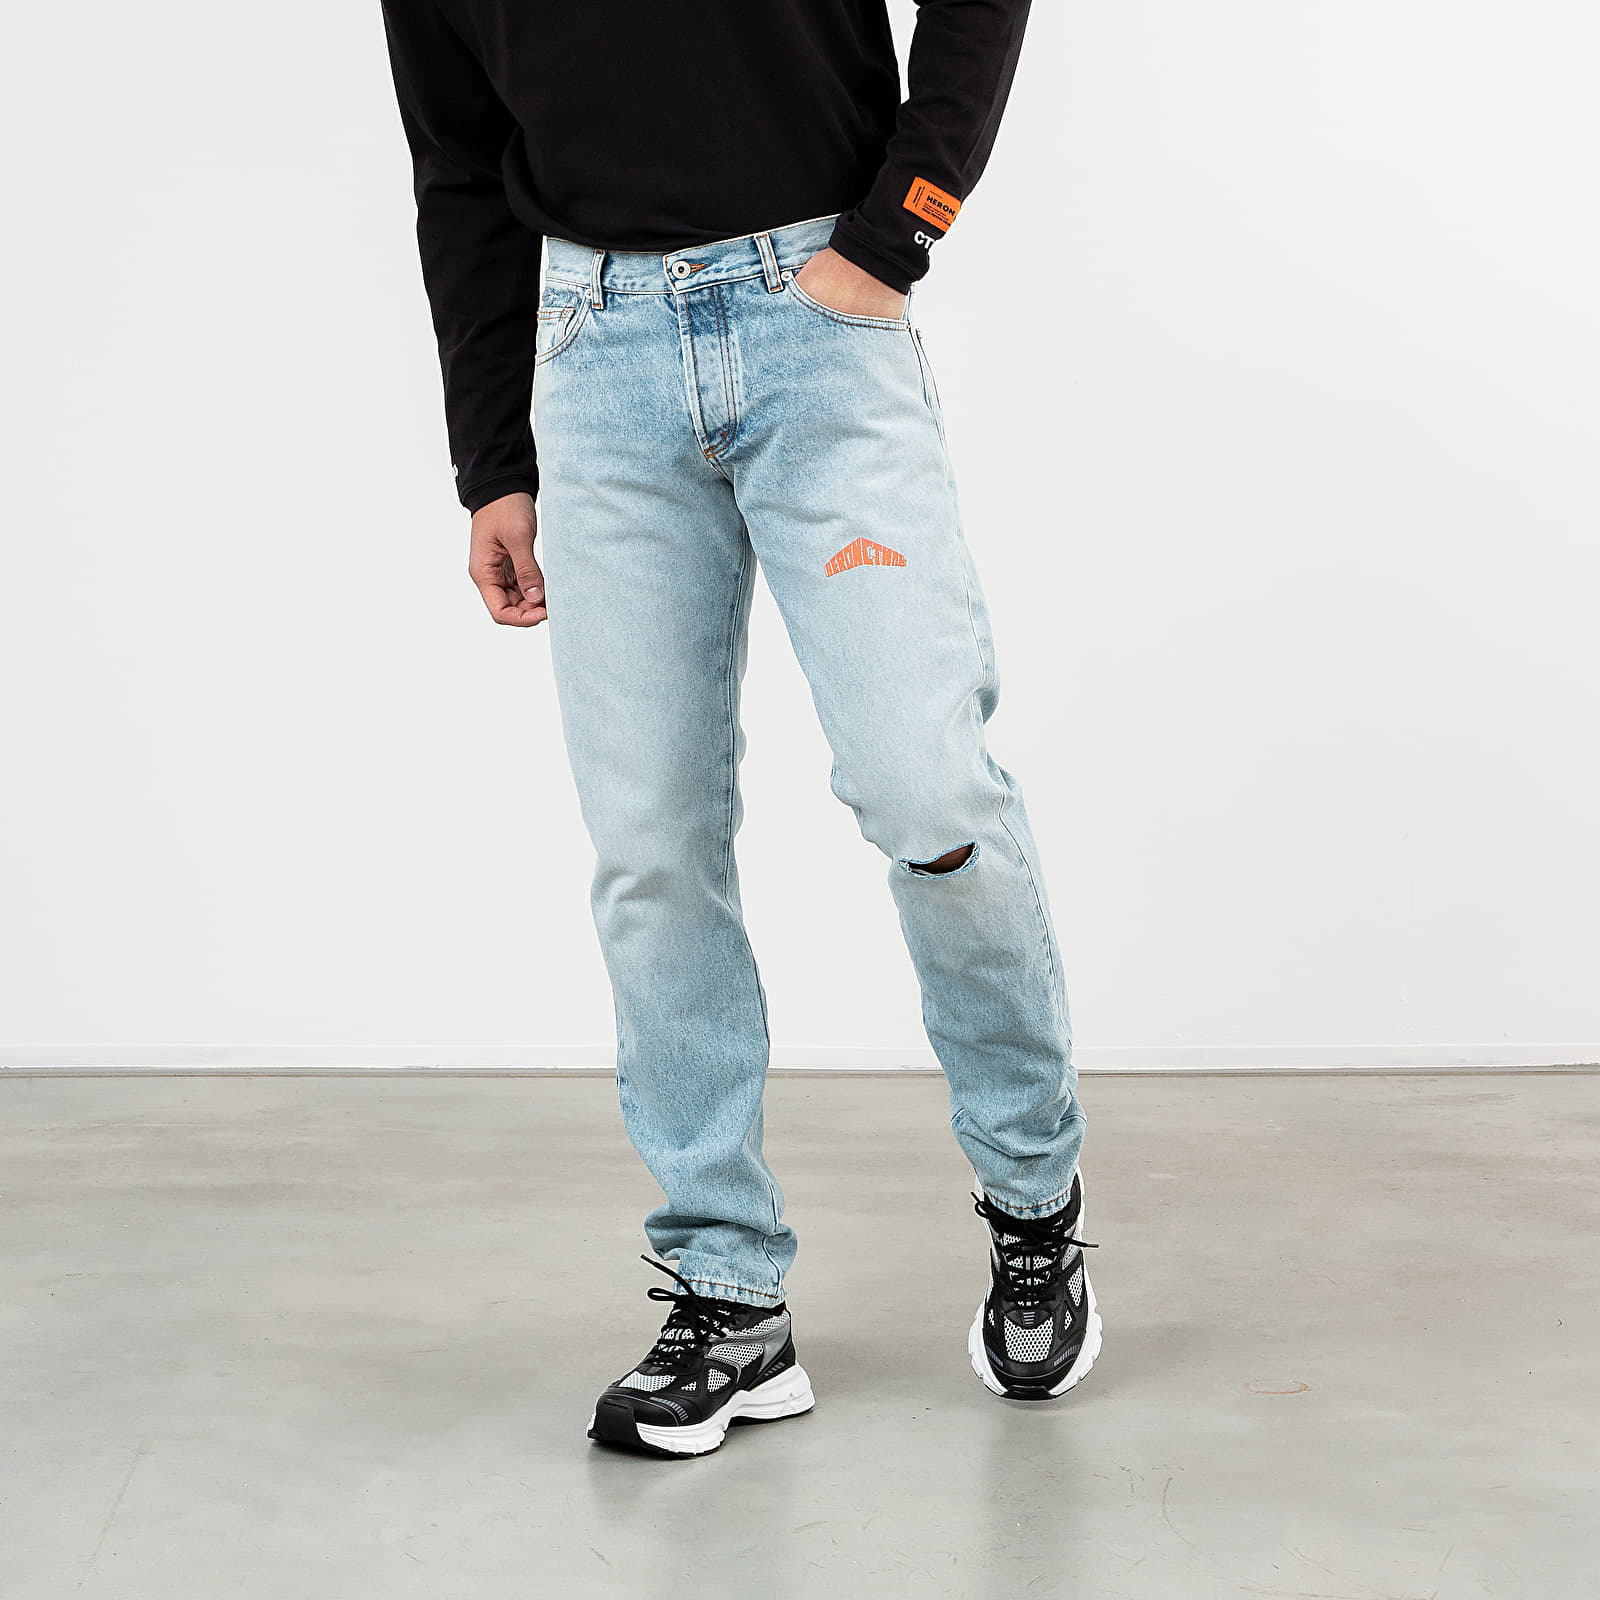 Džínsy a nohavice HERON PRESTON 5 Pockets Denim Pants Vintage Wash Blue